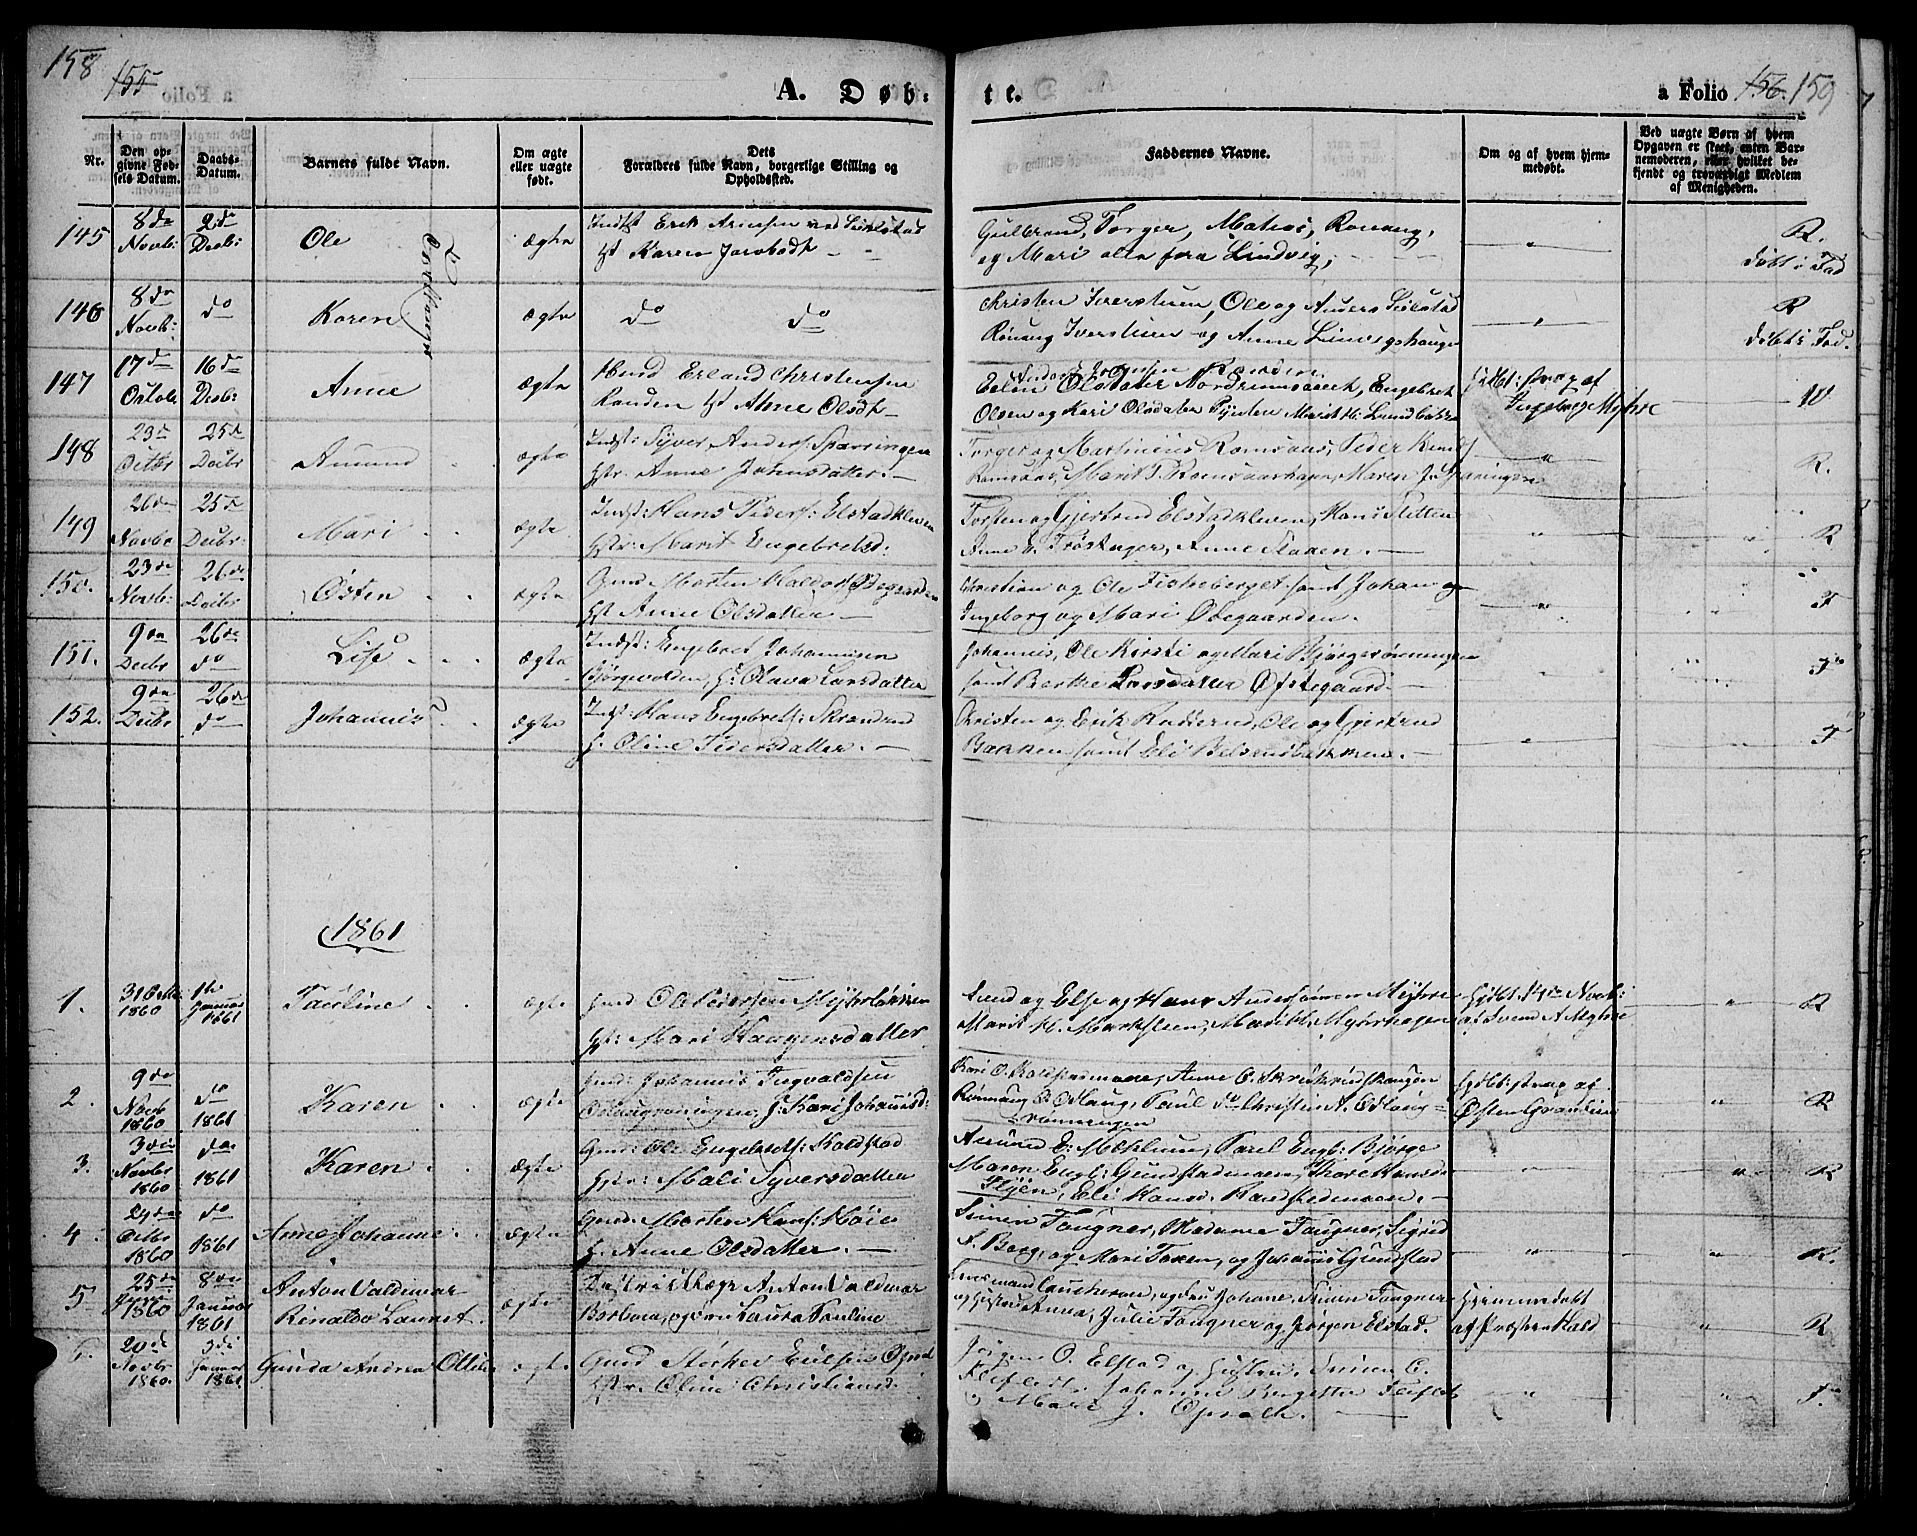 SAH, Ringebu prestekontor, Klokkerbok nr. 3, 1854-1866, s. 158-159